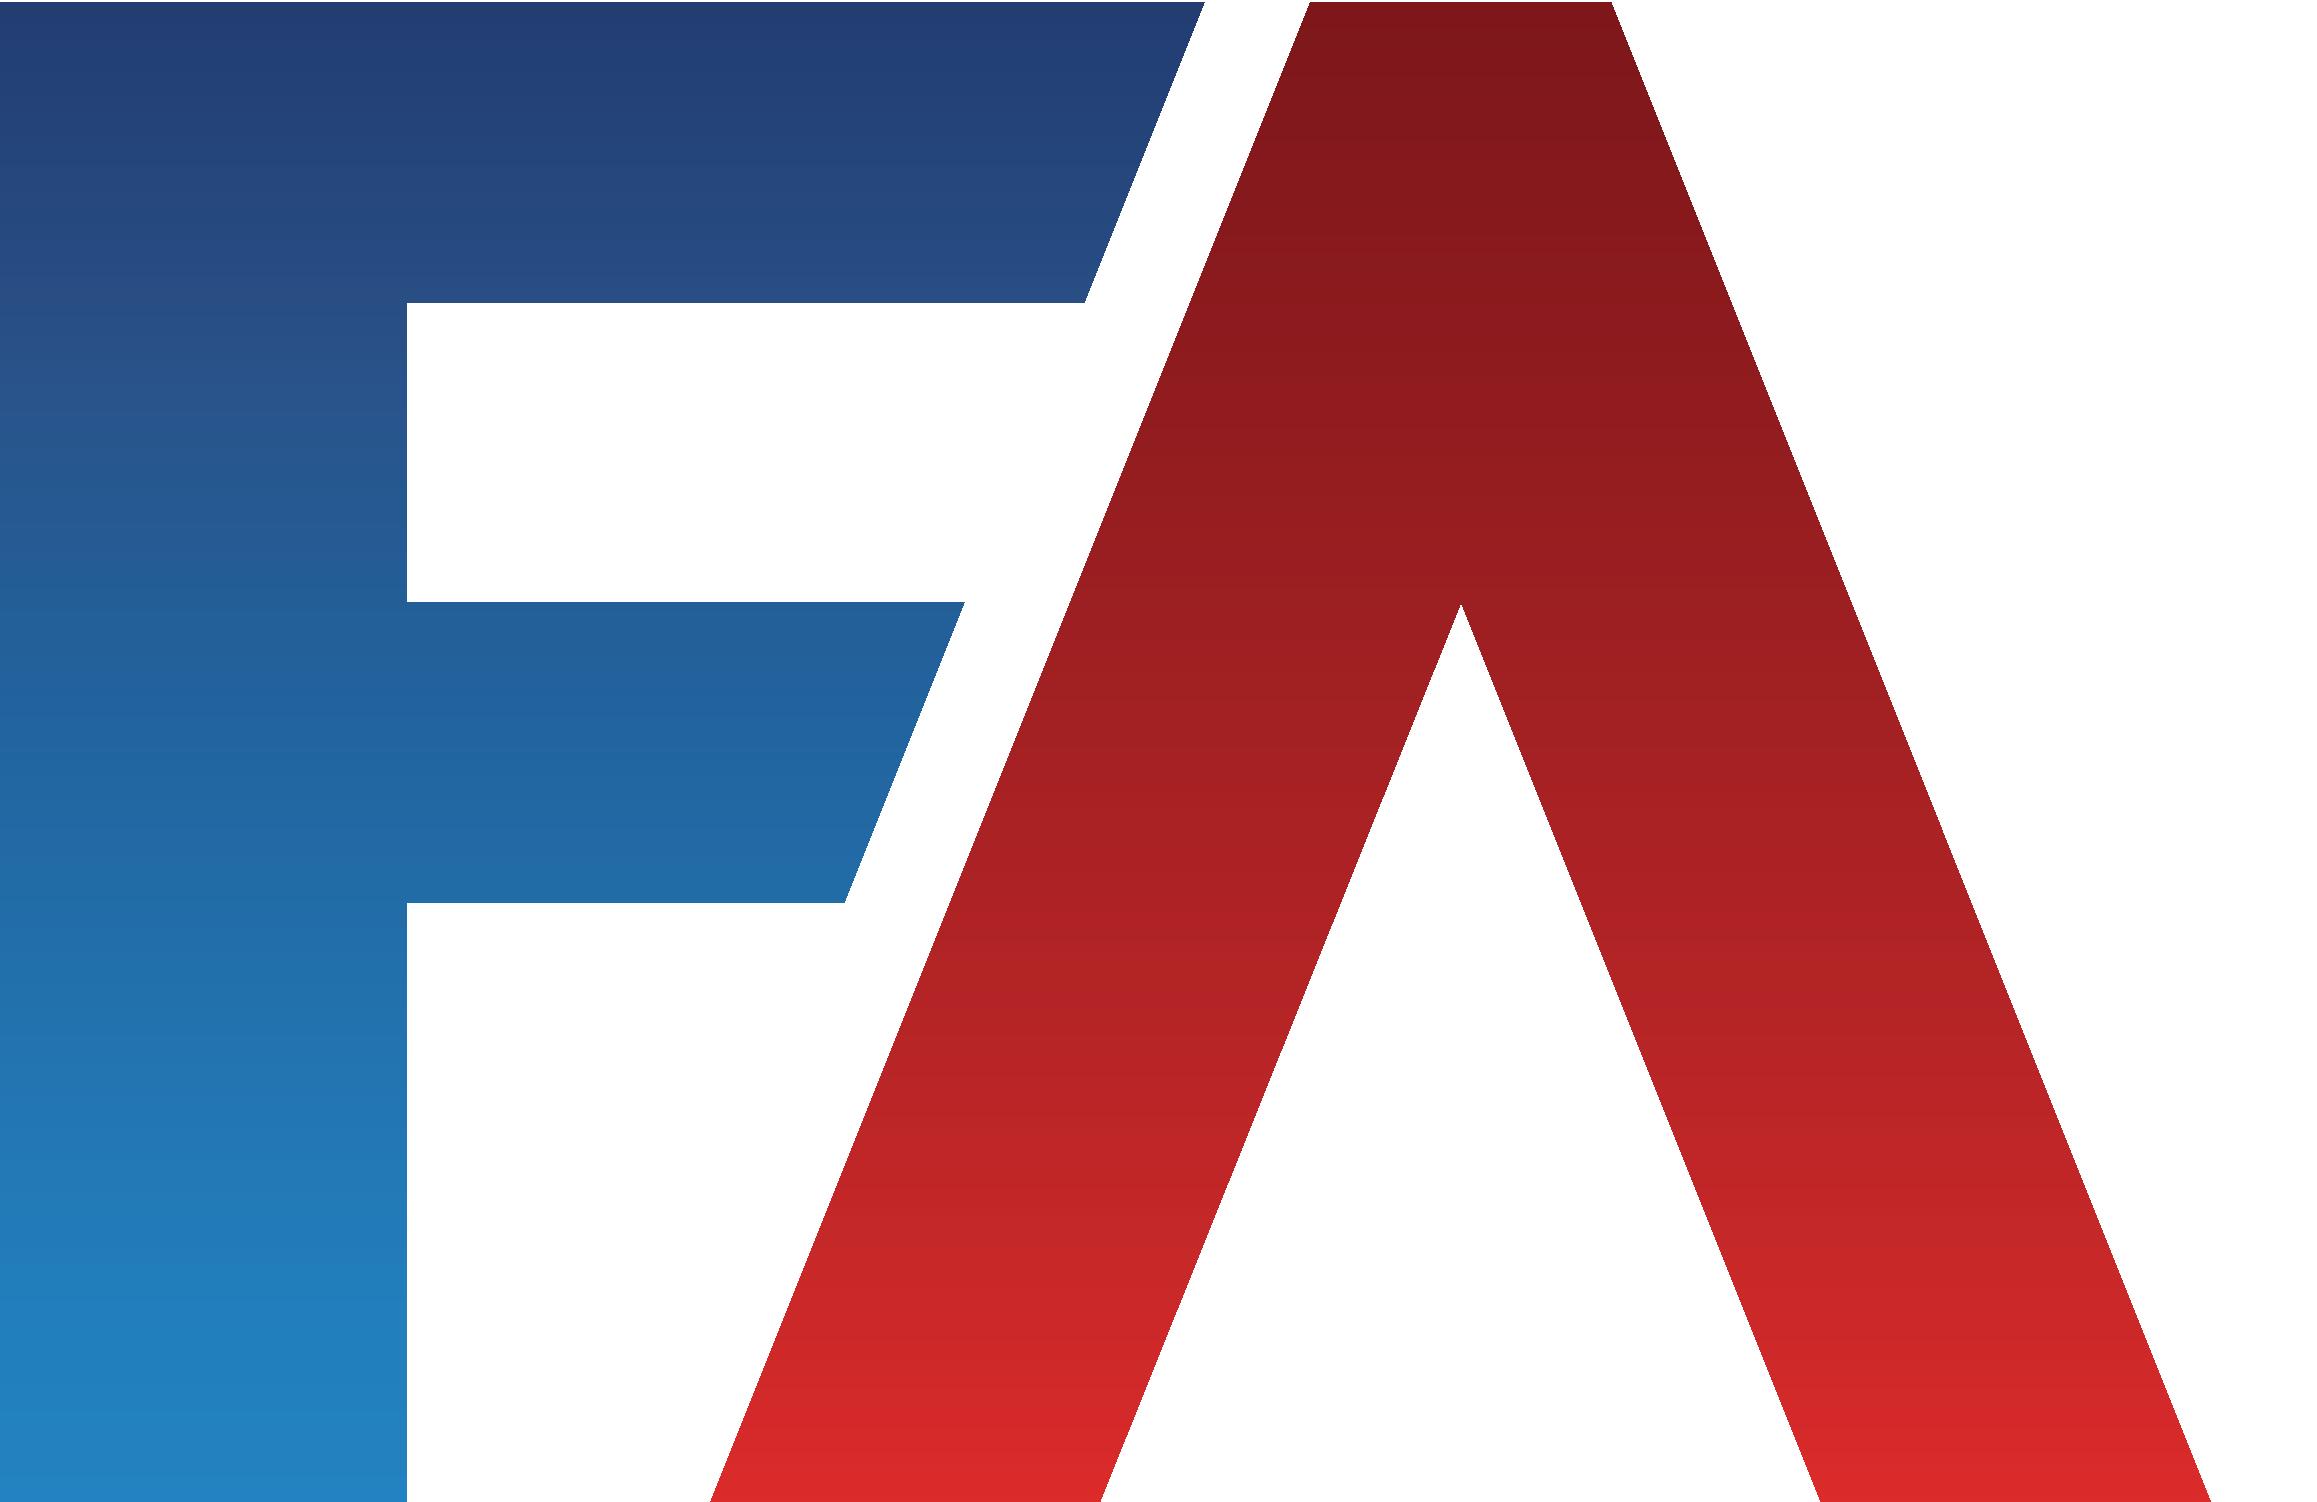 Dirk Nowitzki - PF | FantasyAlarm.com